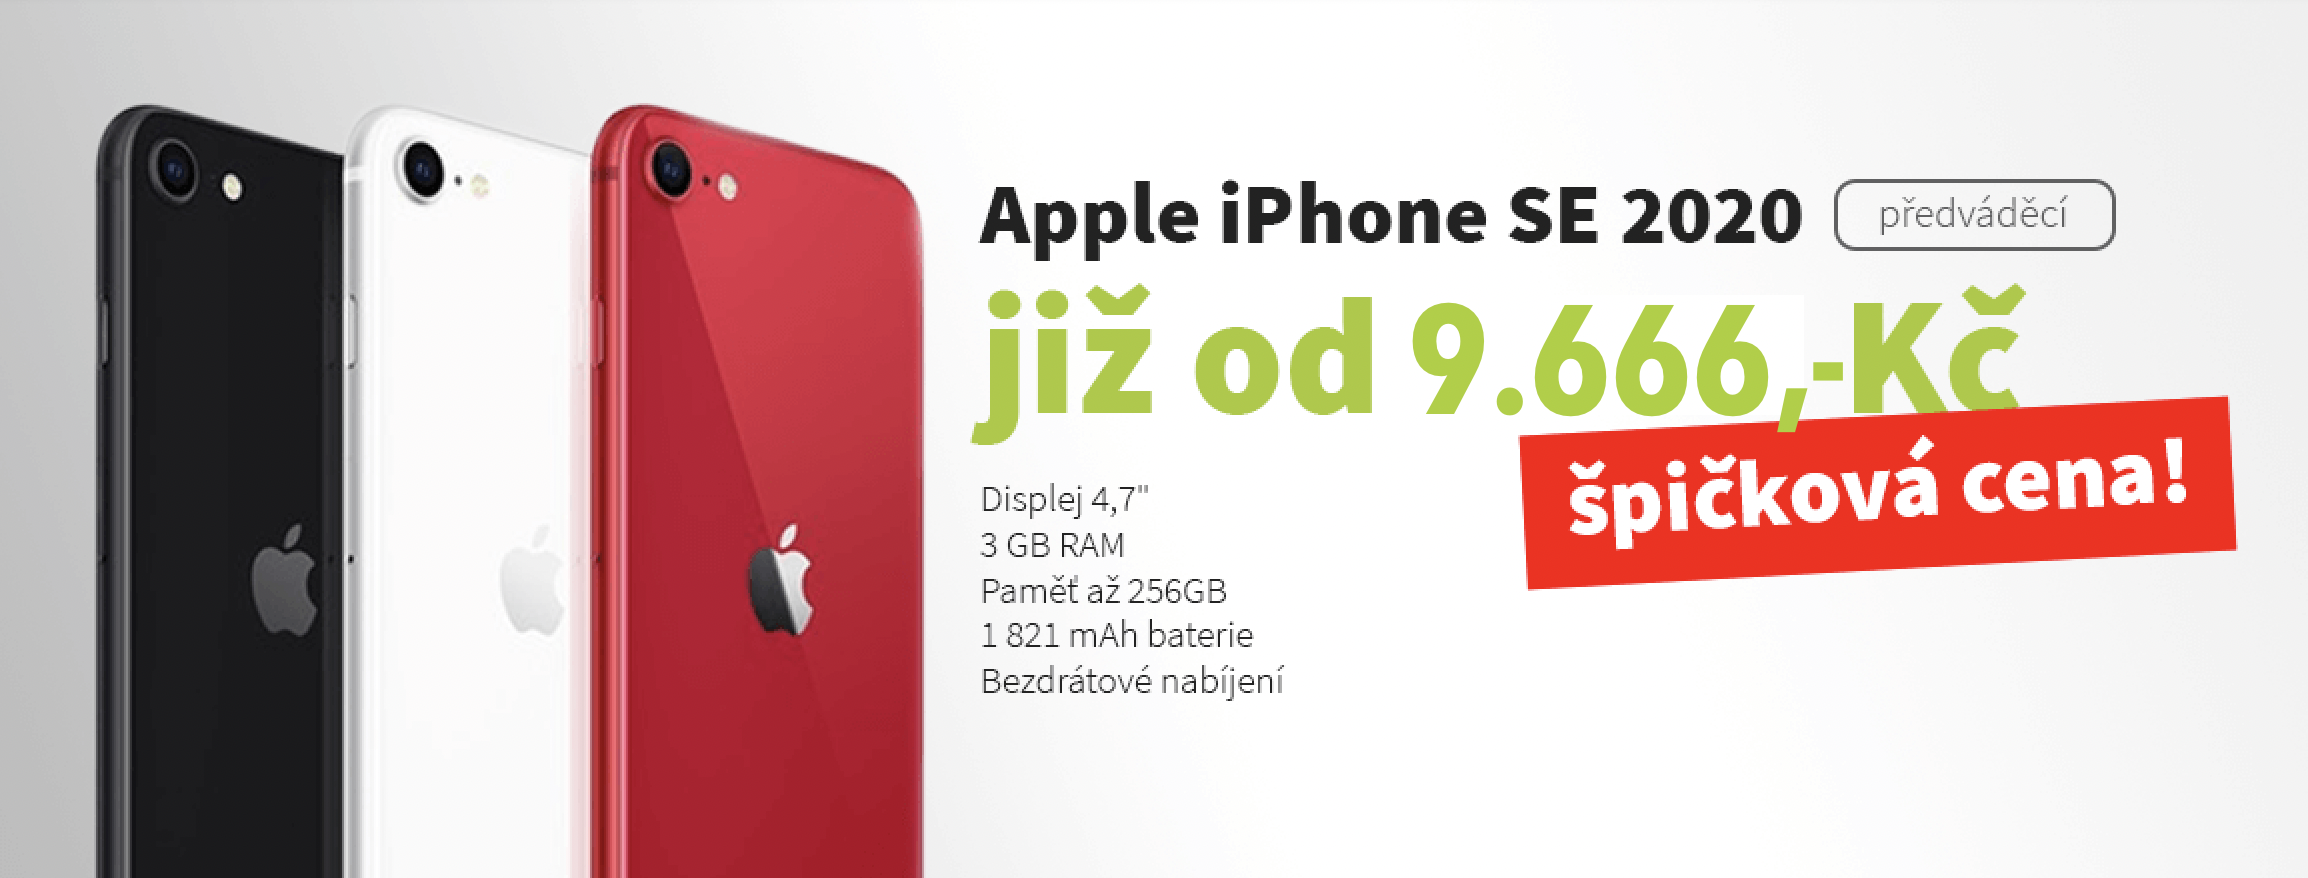 IPHONE SE 2020 NEW